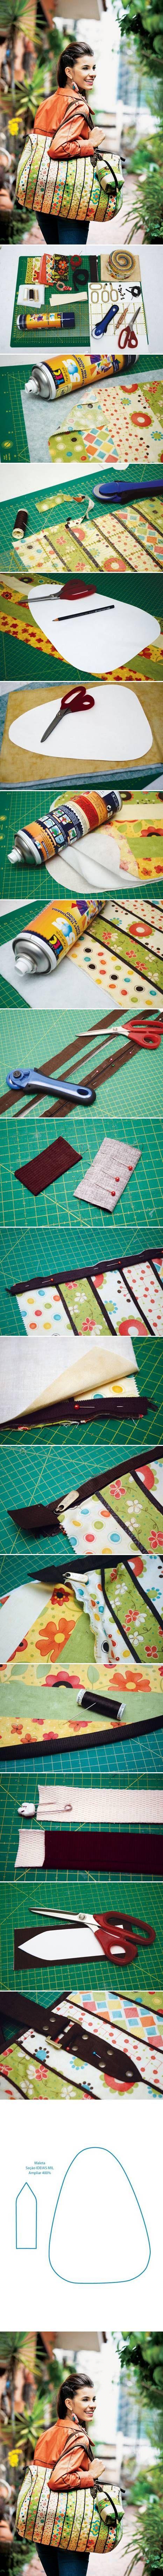 DIY Sew Travel Bag DIY Projects   UsefulDIY.com